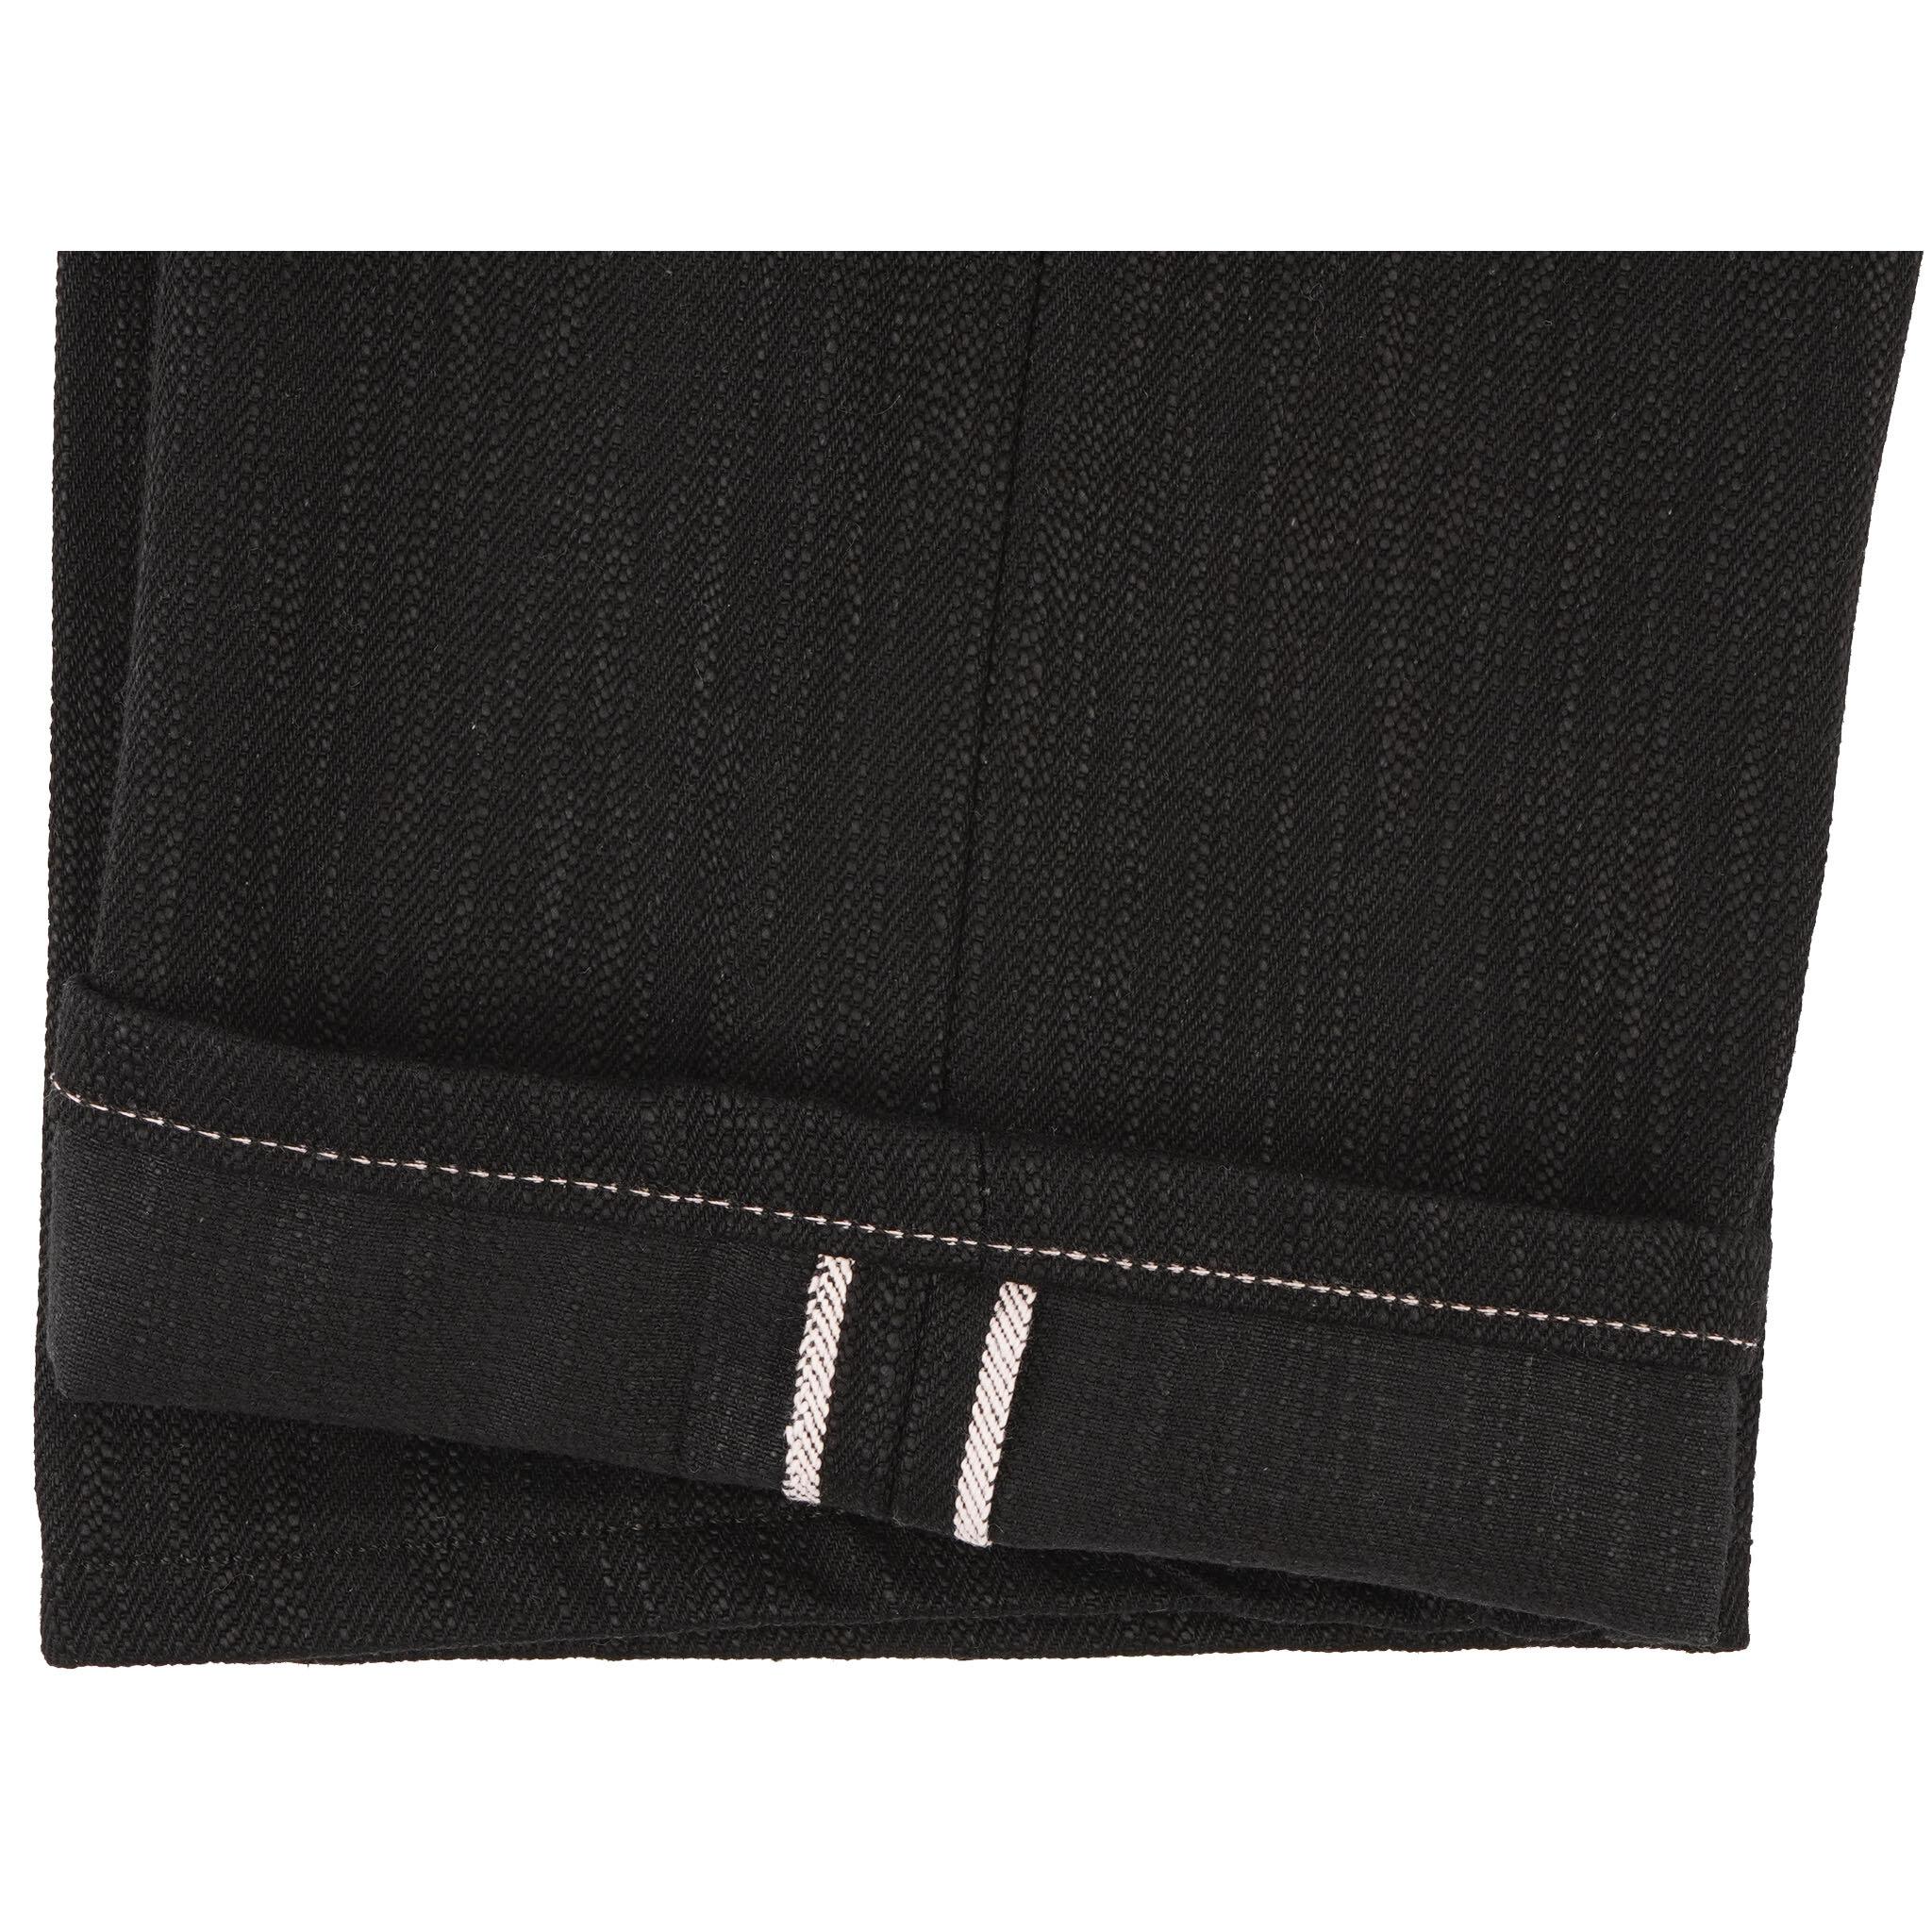 Majin Buu Innocent Selvedge jeans - hem